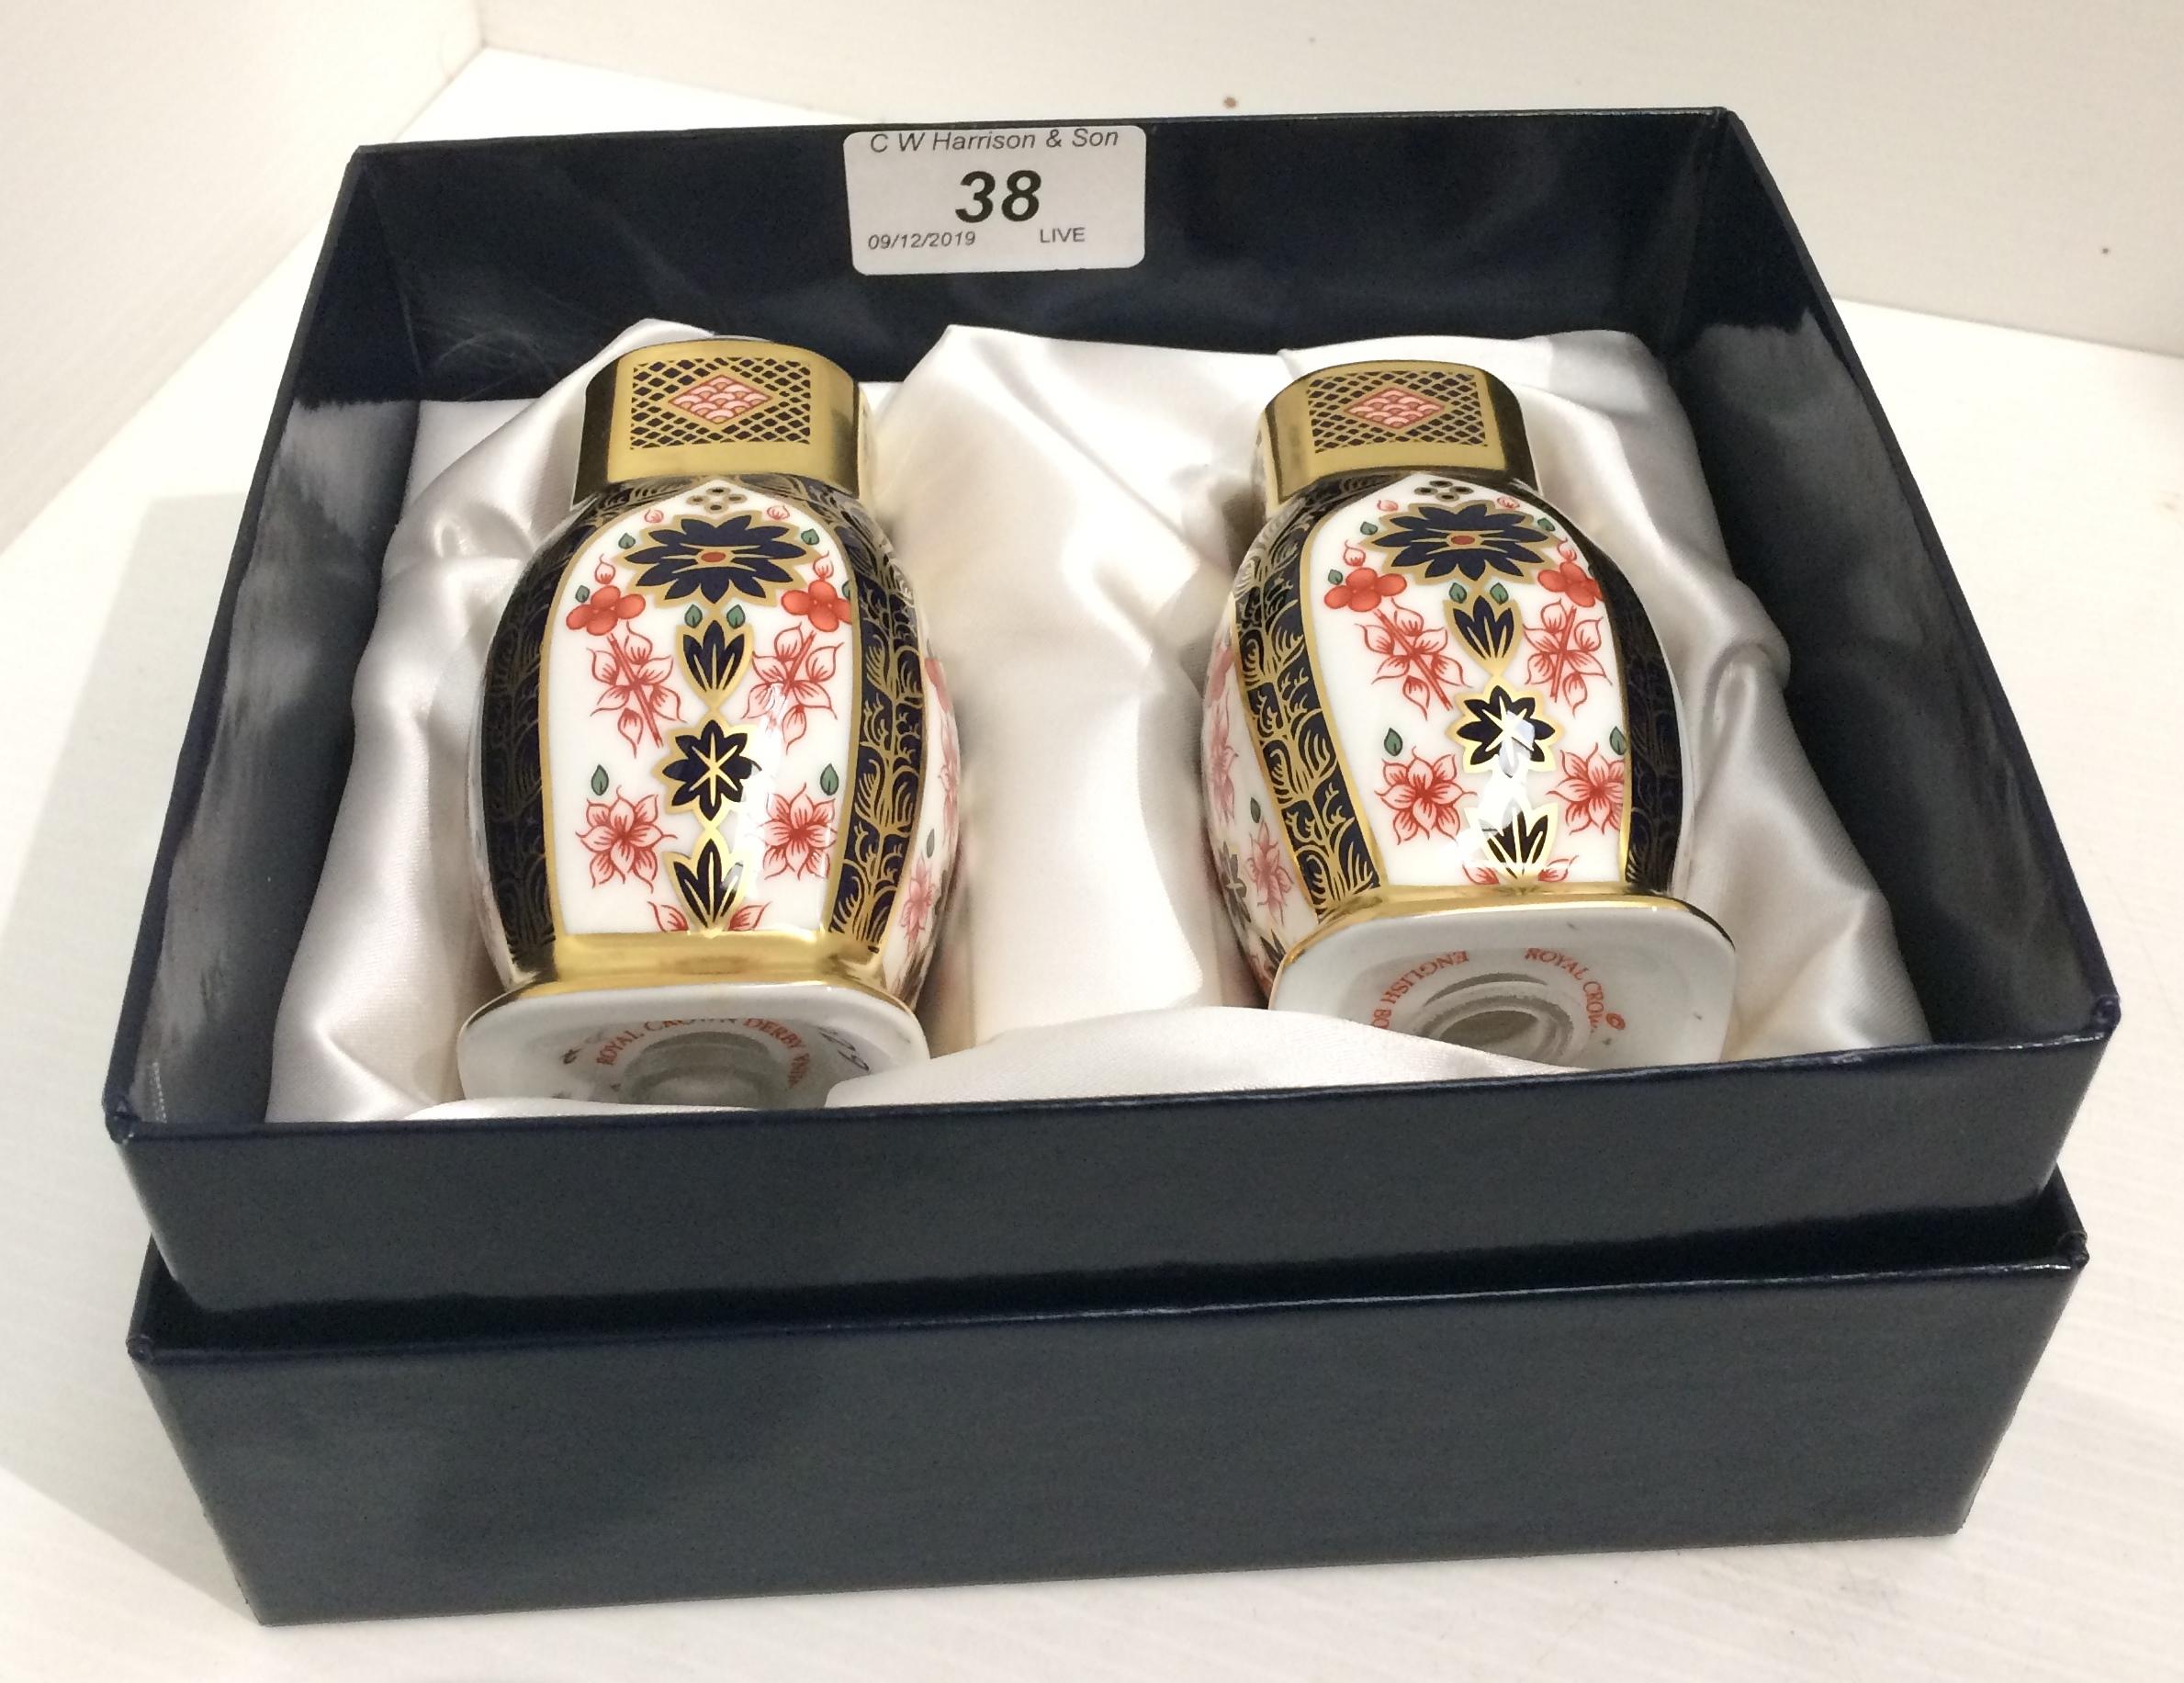 Lot 38 - A Royal Crown Derby bone china two piece cruet set (salt and pepper) - boxed